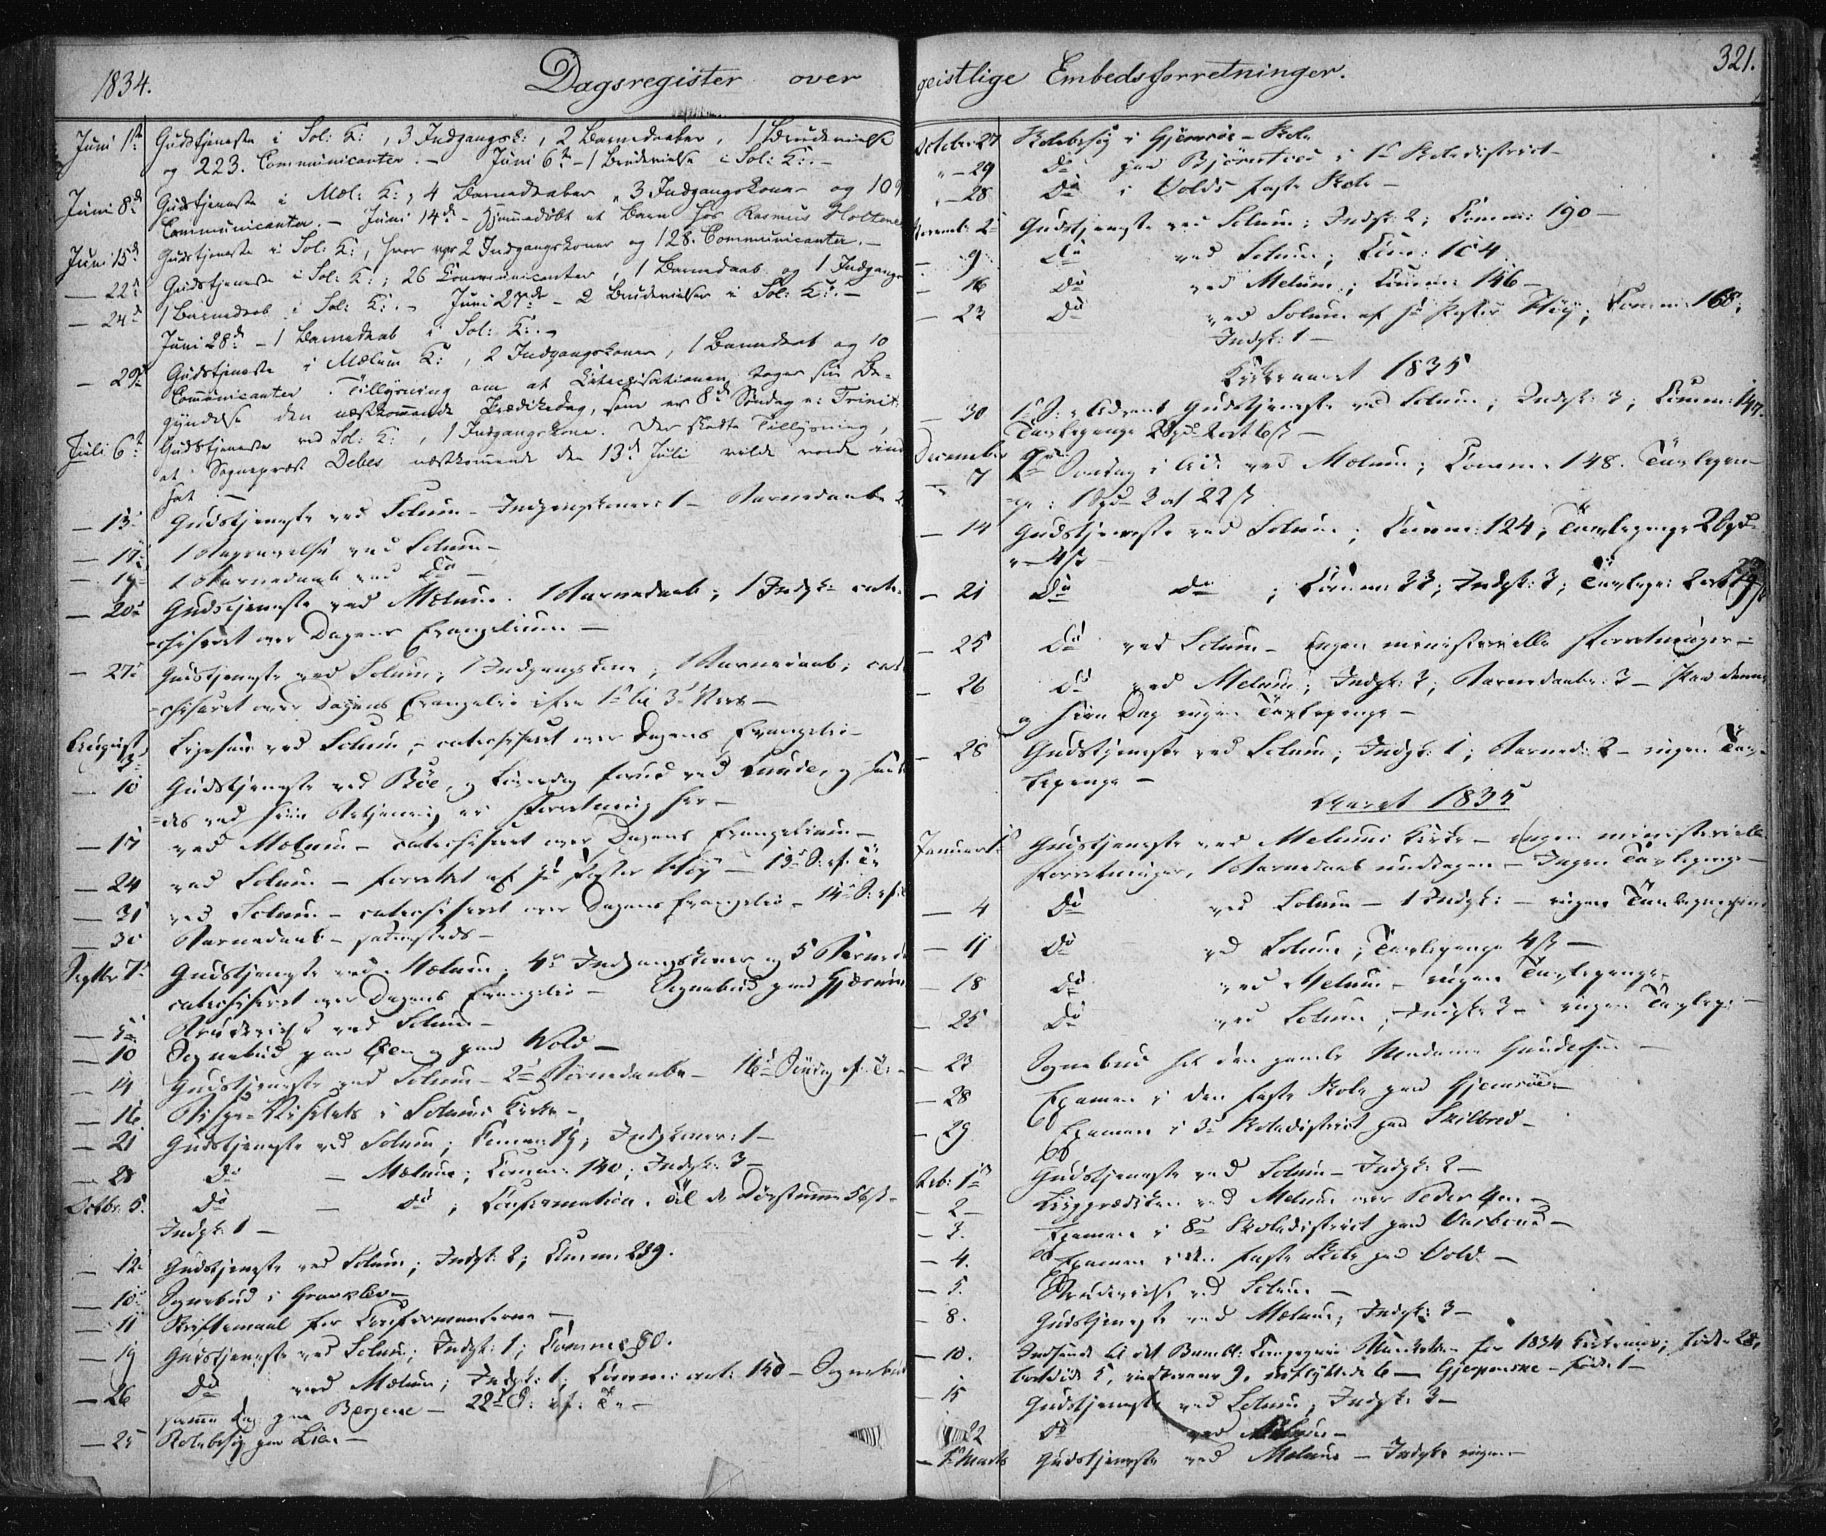 SAKO, Solum kirkebøker, F/Fa/L0005: Ministerialbok nr. I 5, 1833-1843, s. 321